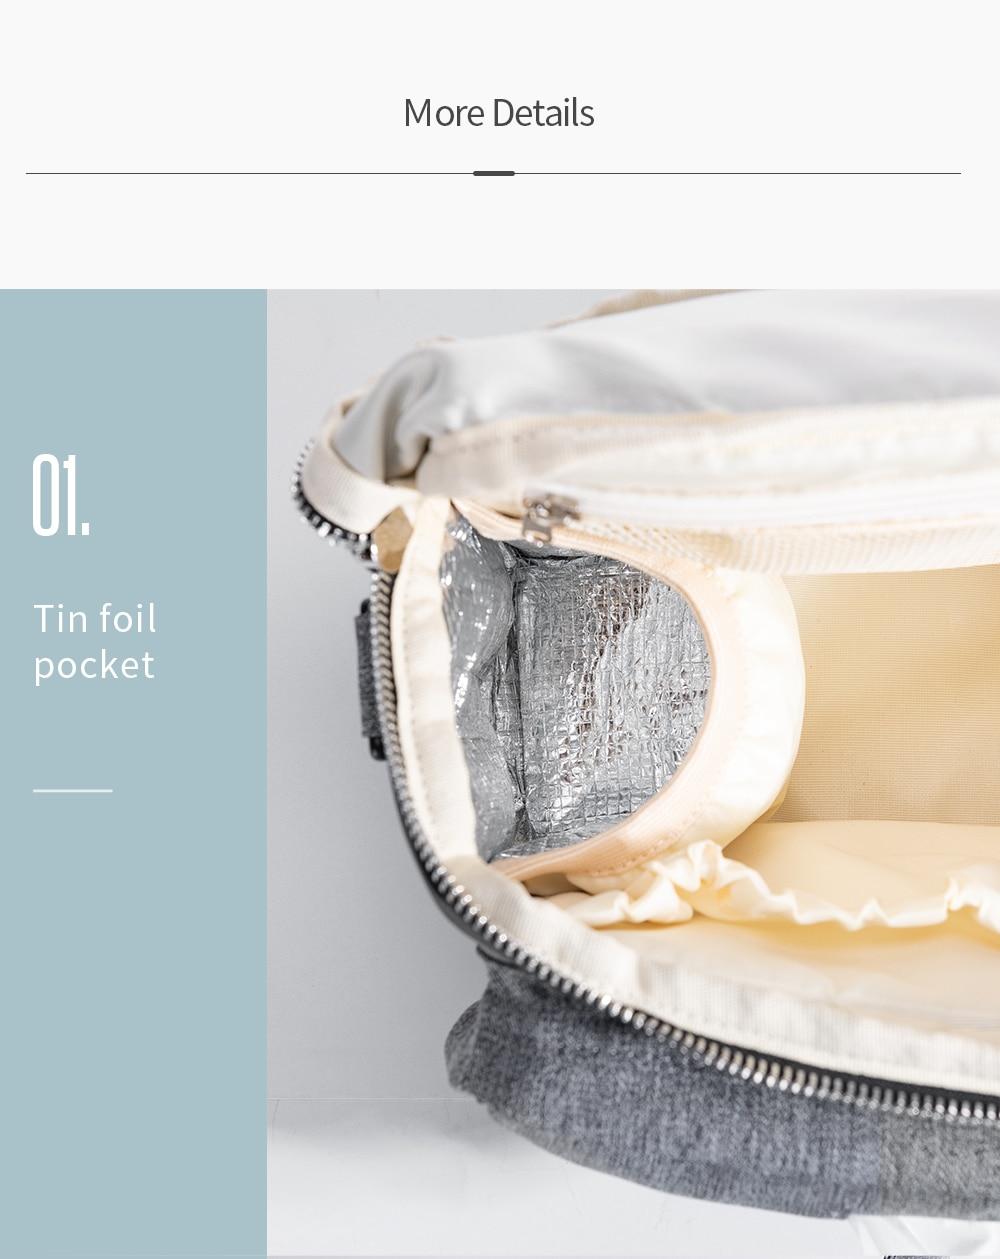 HTB1AvMIXED1gK0jSZFGq6zd3FXaB SUNVENO Diaper Bag For Baby Stuff Nappy Bag Stroller Organizer Baby Bag Mom Travel Hanging Carriage Pram Buggy Cart Bottle Bag